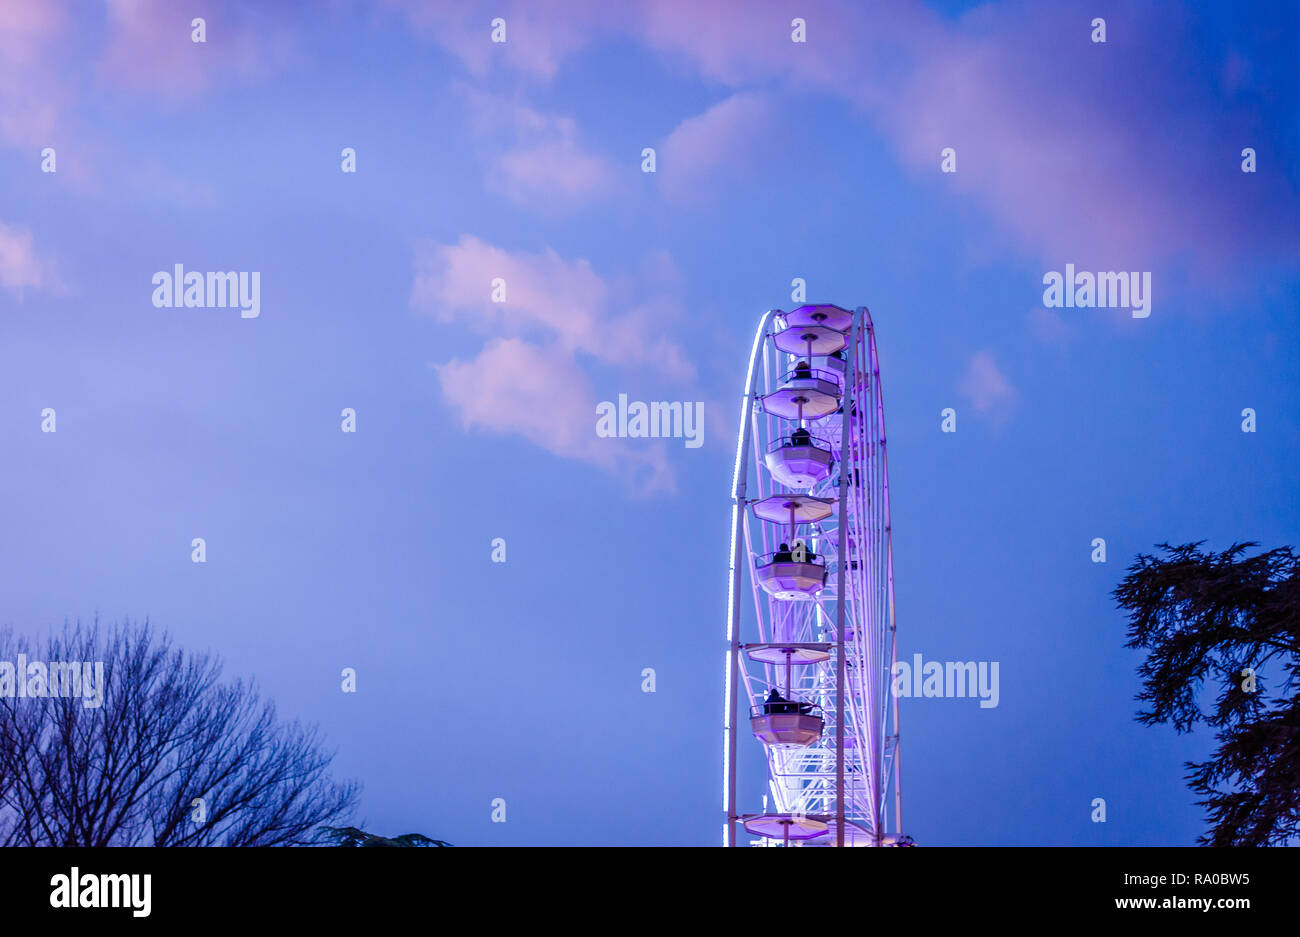 The big ferris wheel on background of sunny blue sky Stock Photo